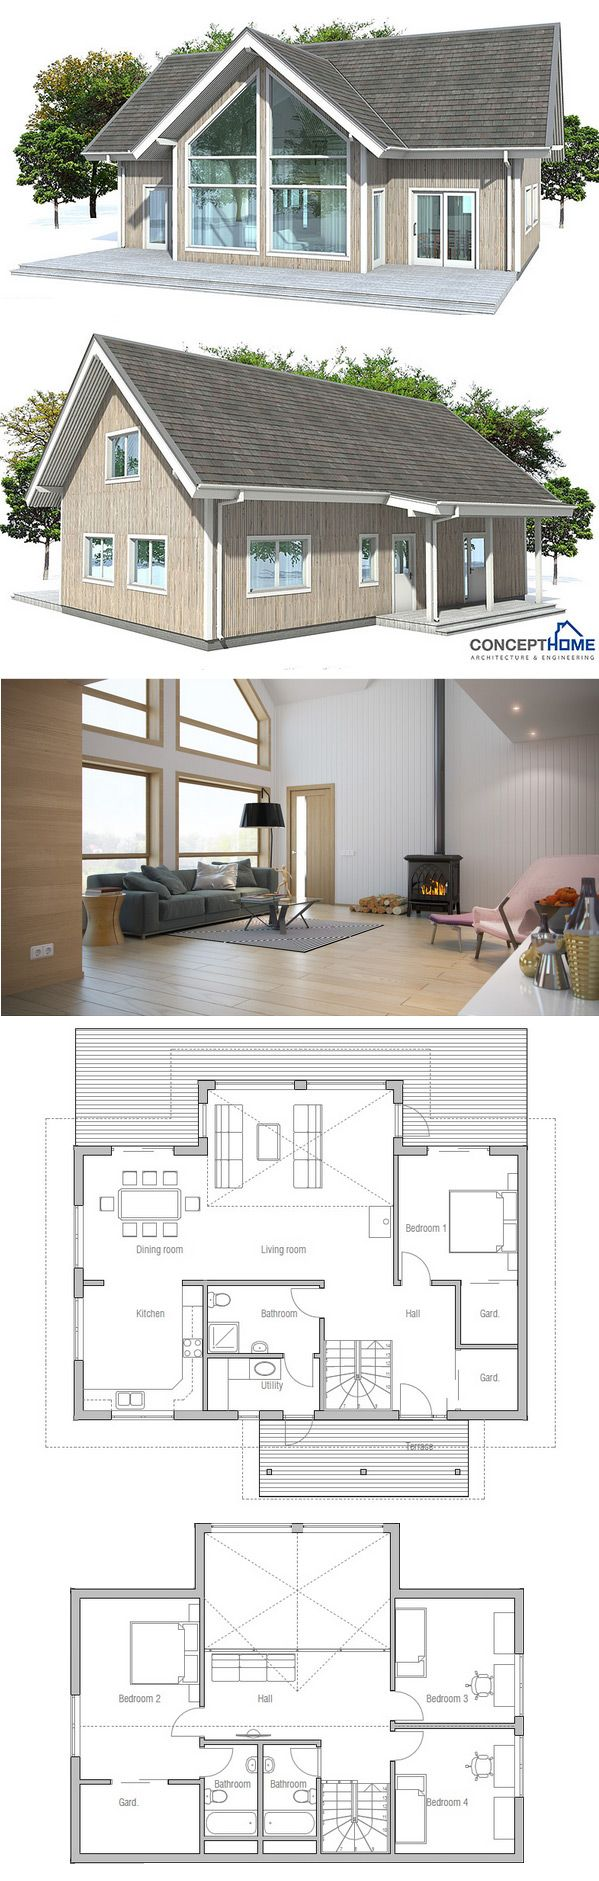 Desertroseplan De Petite Maison Architecture